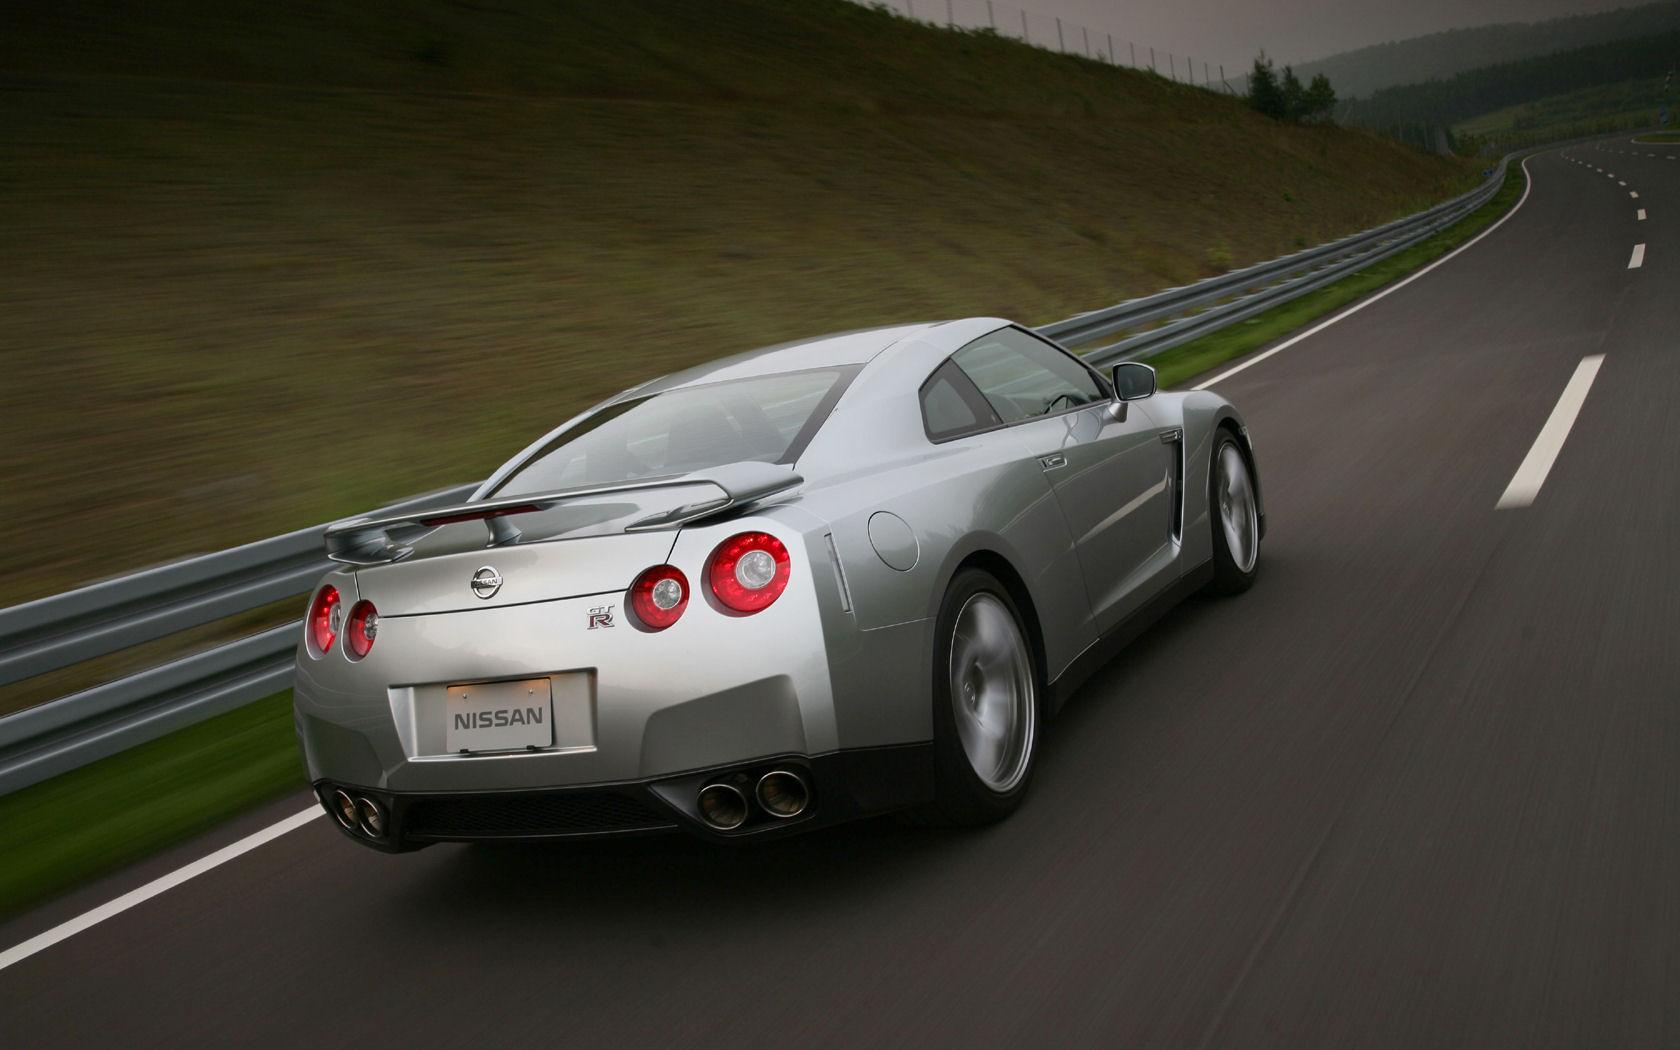 Nissan GT-R Desktop Wallpaper